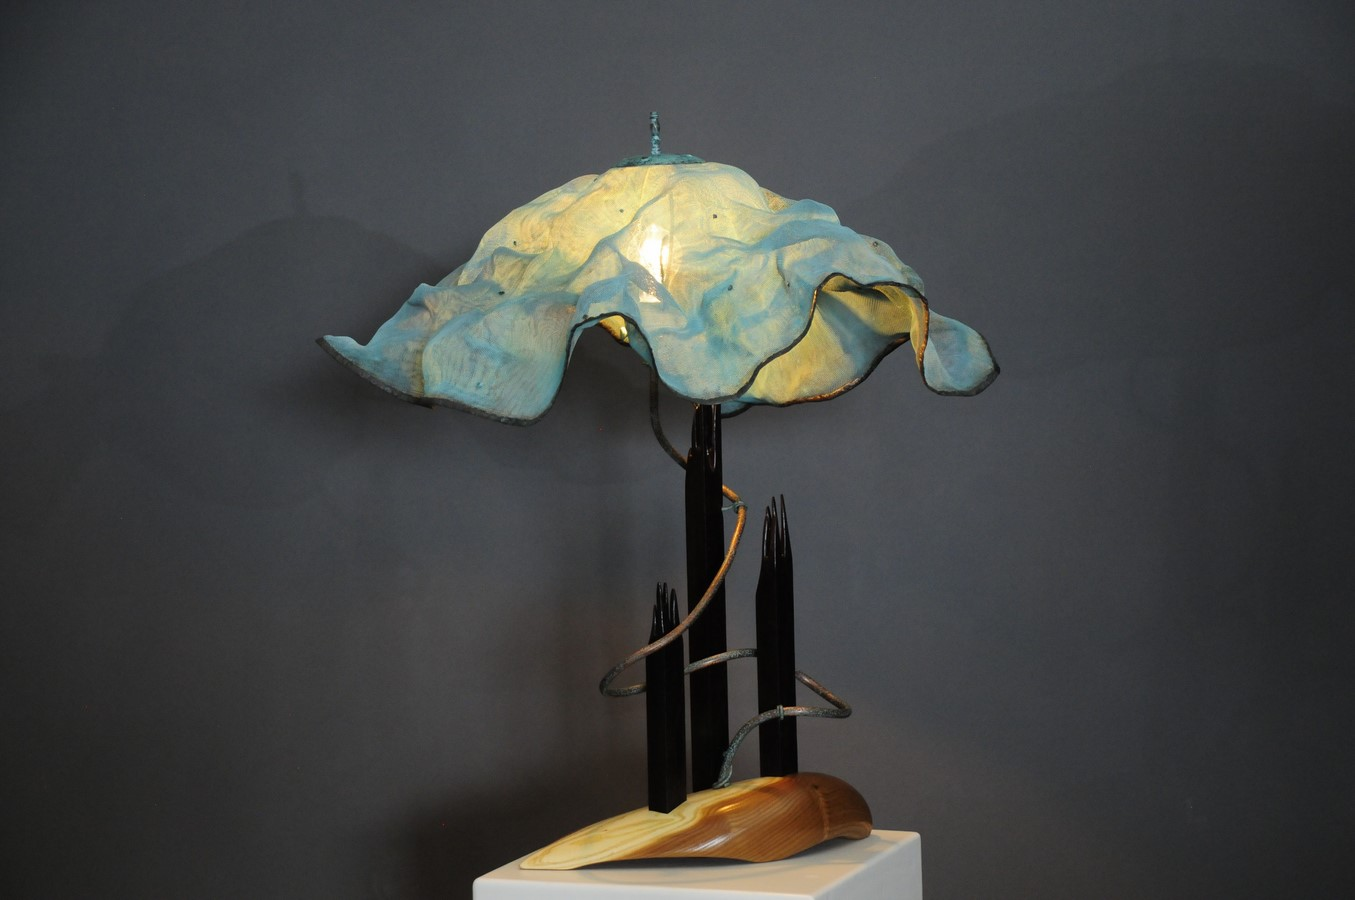 Free Falling - a lamp